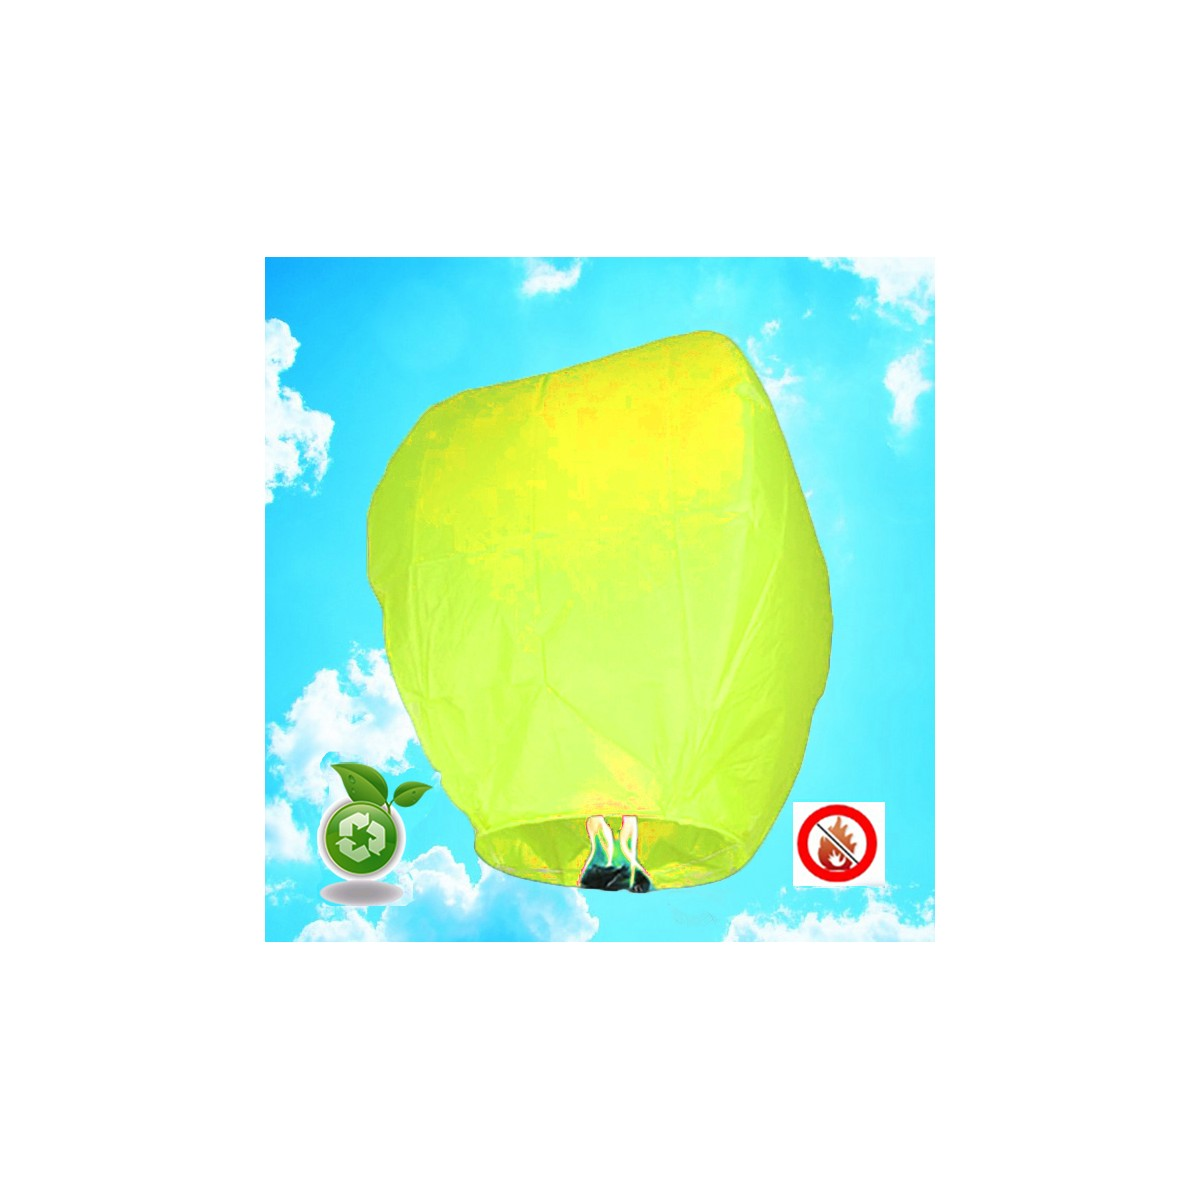 Lanterne Volante Biodégradable - Jaune